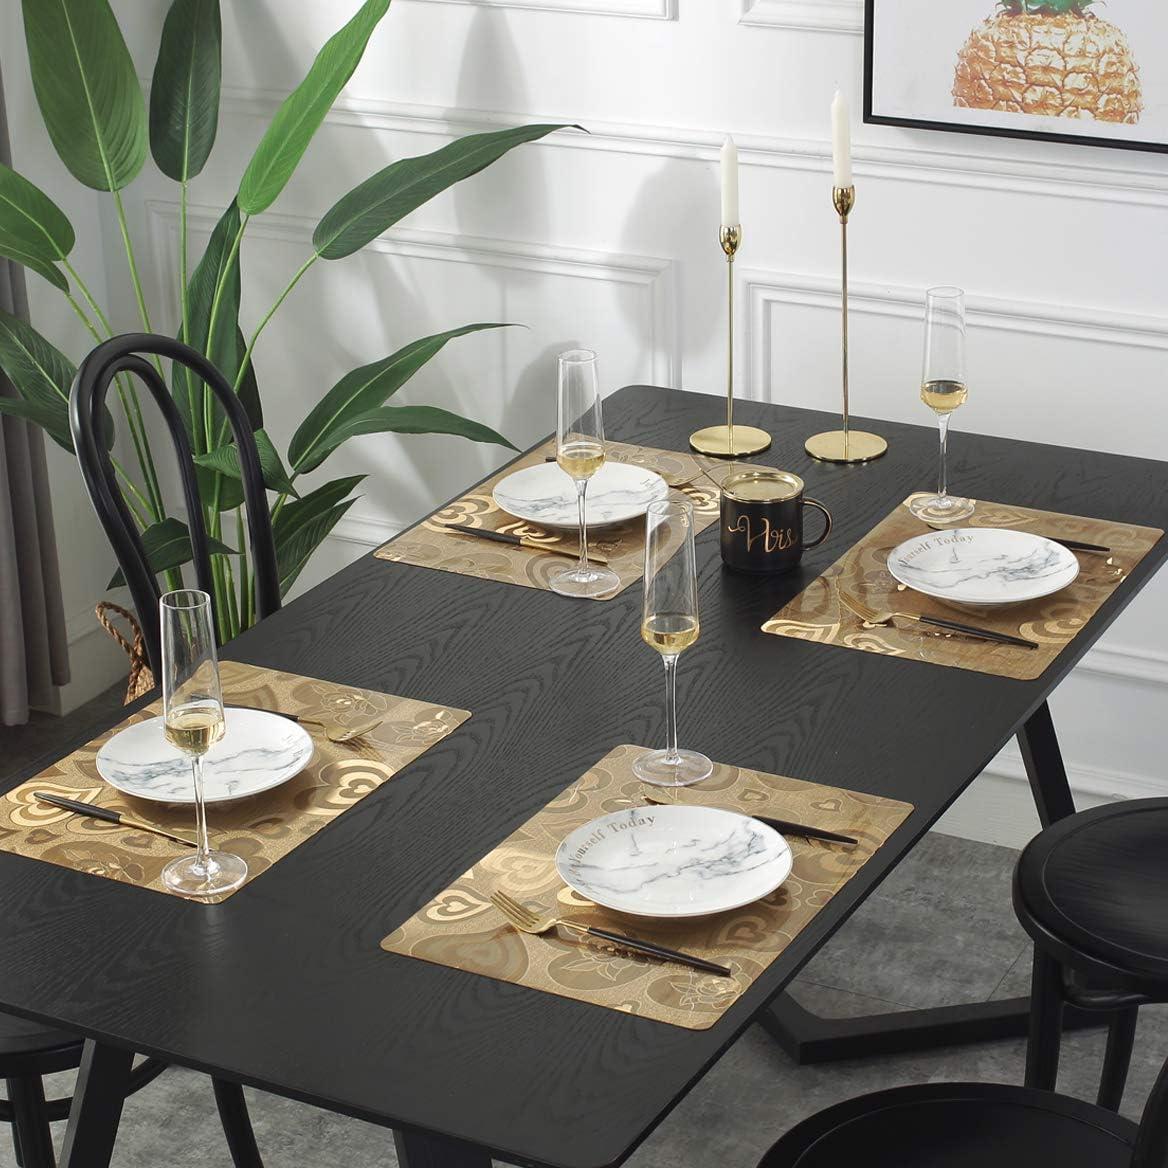 DUOFIRE Vinyl Placemats Washable PVC Kitchen Table Mats Crack Pattern:Brown-Set of 4